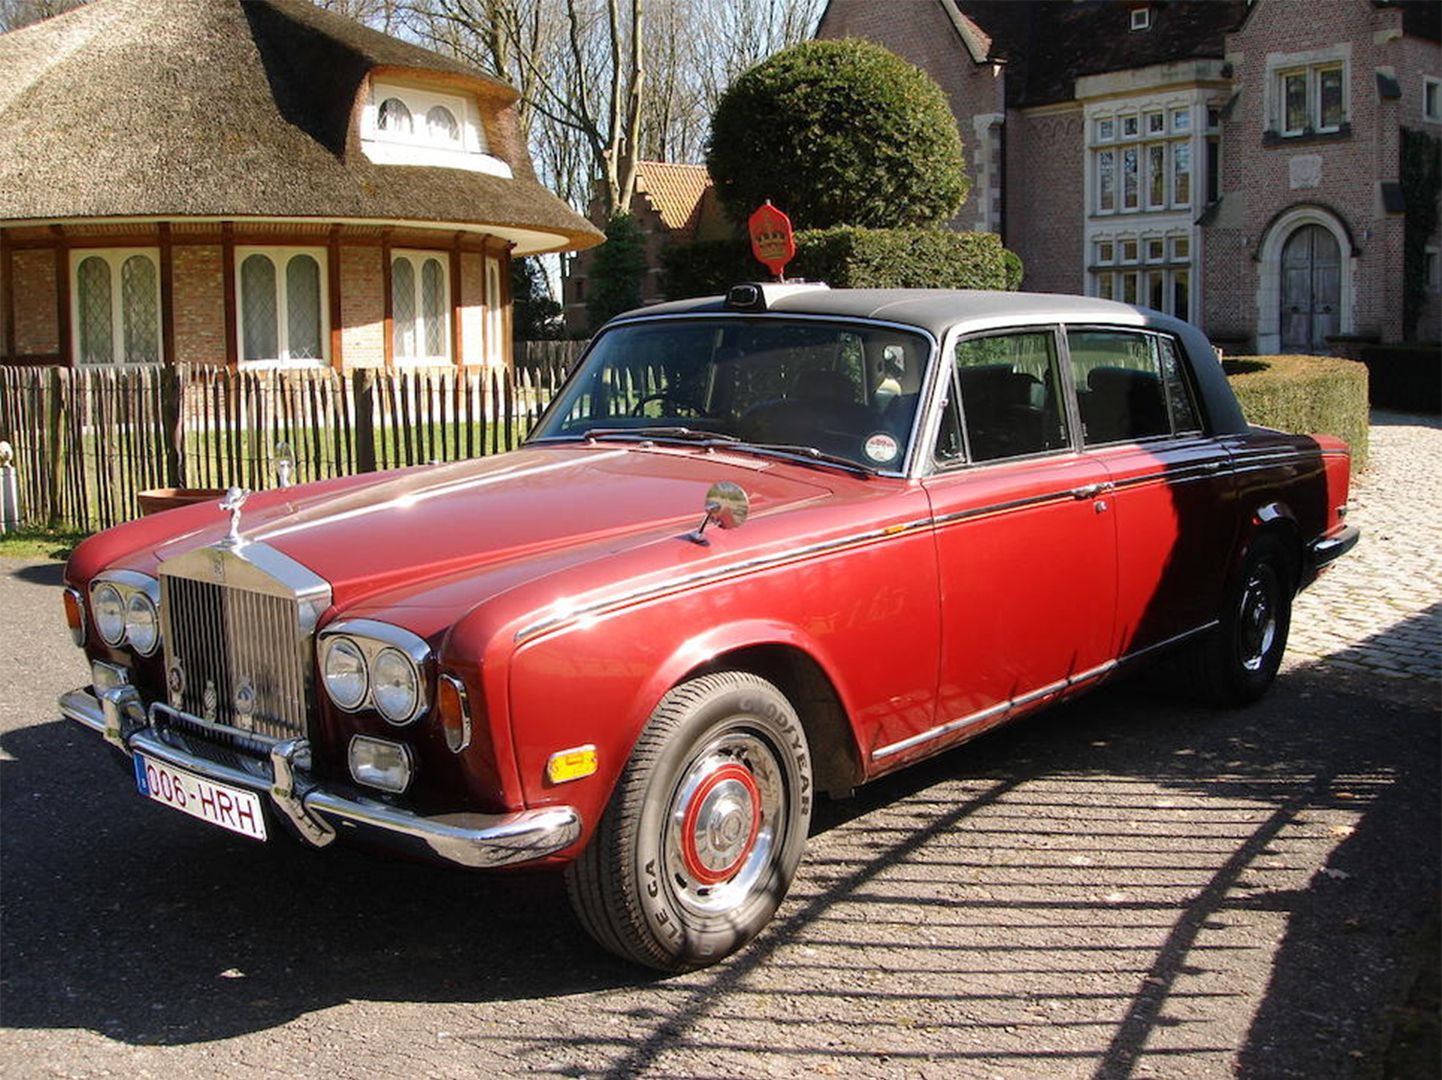 Princess Margaret's 1975 Rolls-Royce Silver Shadow LWB Limousine